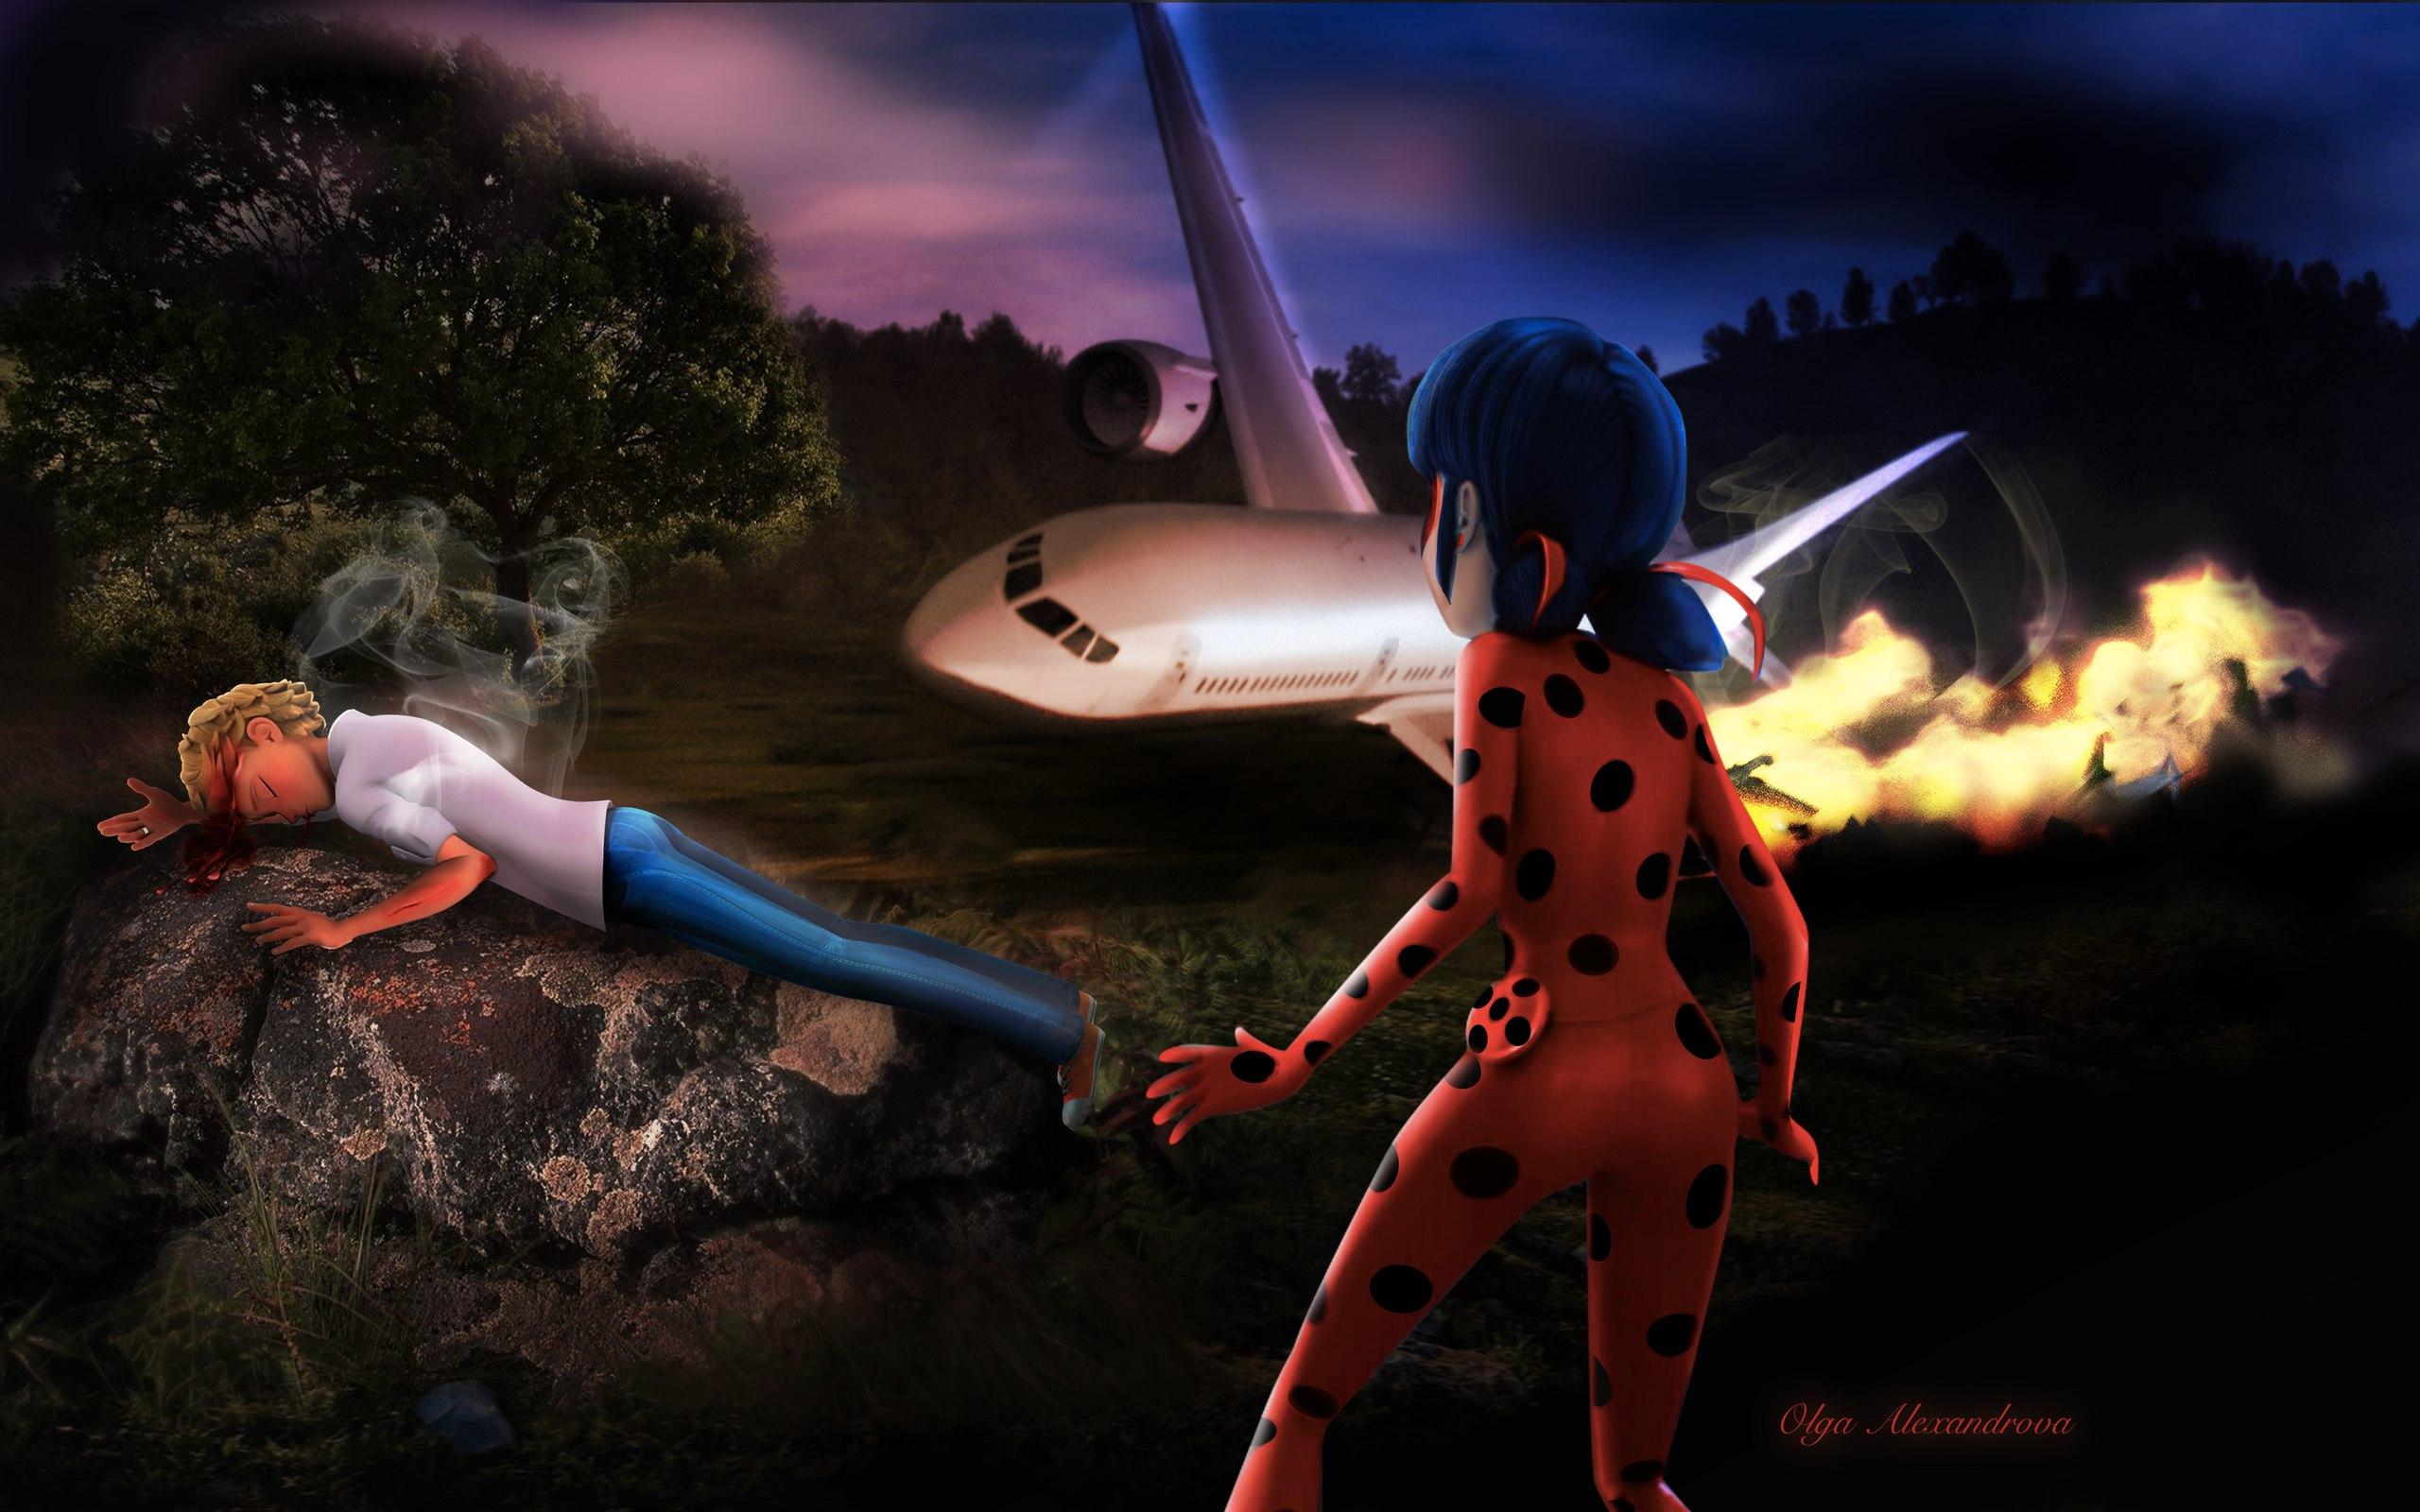 Интересные картинки Леди Баг и Супер Кот - коллекция 10